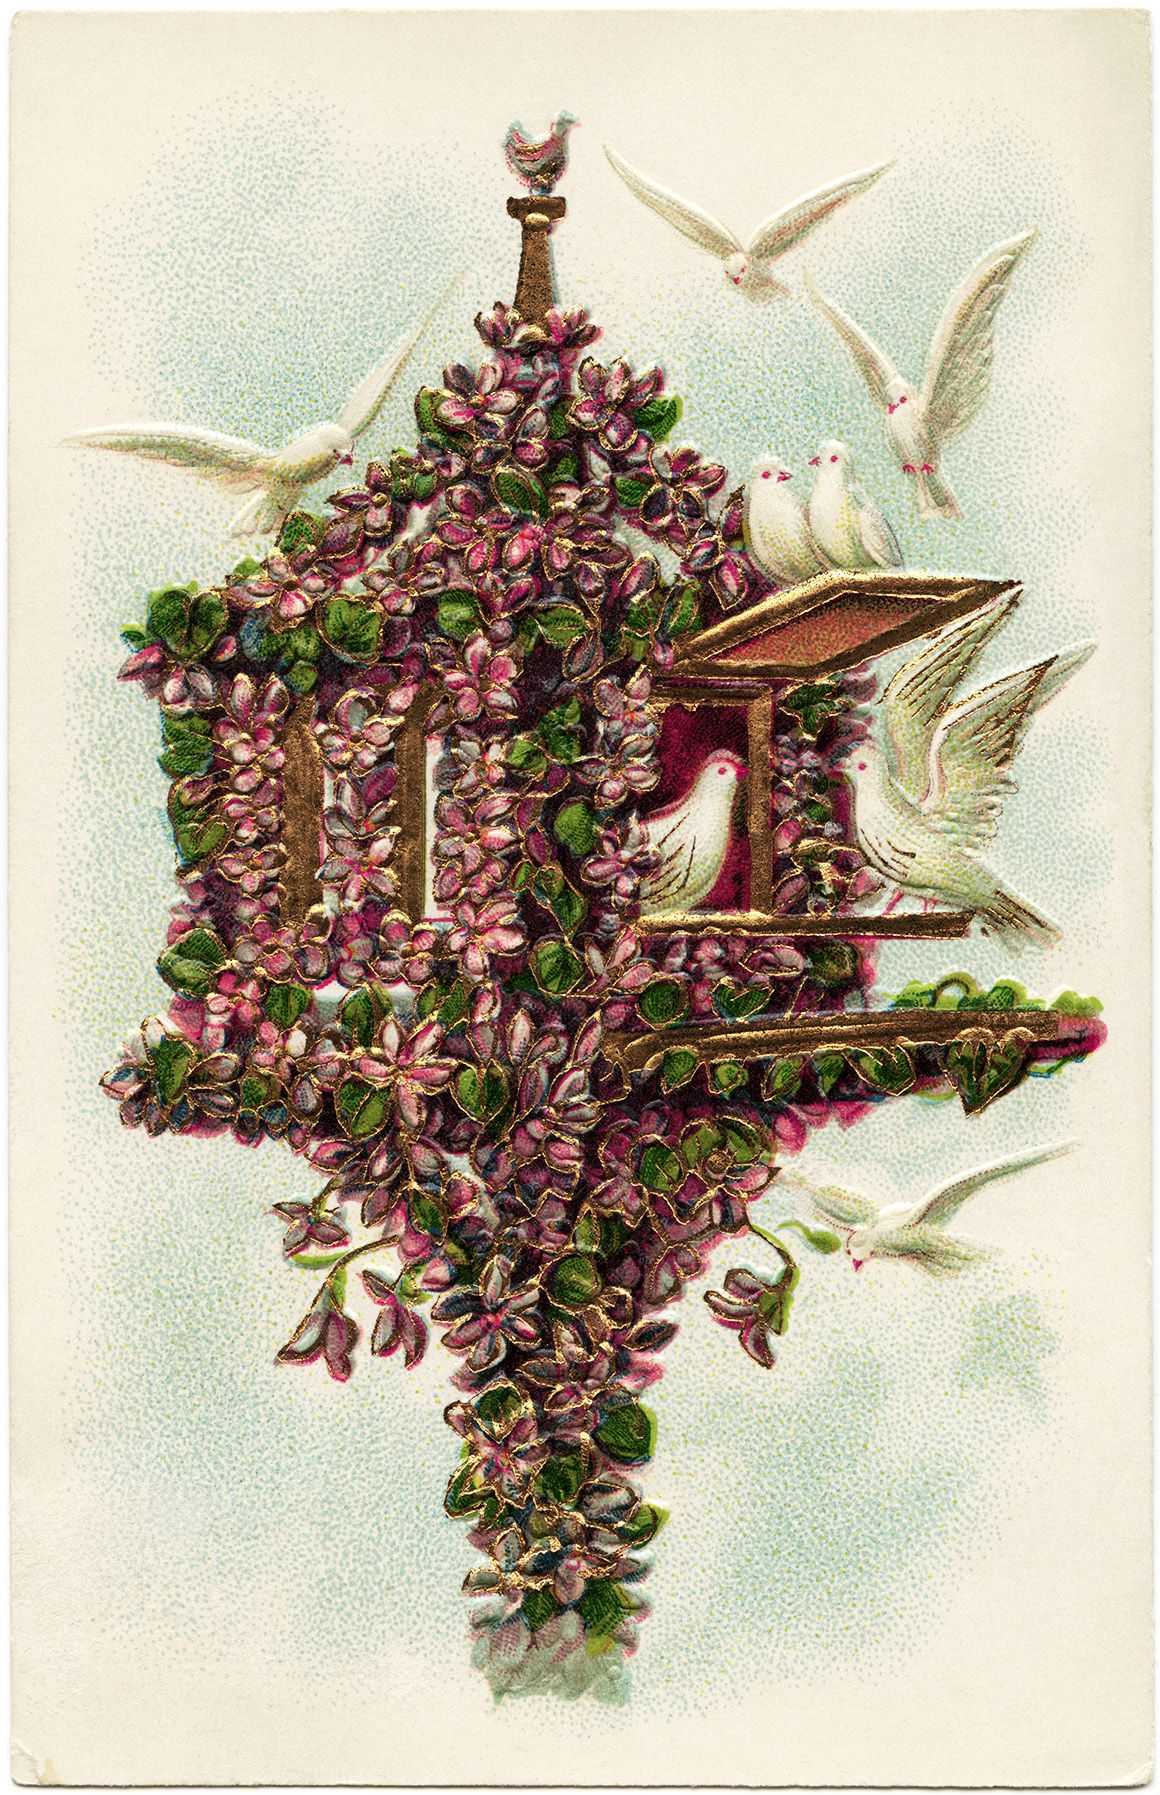 Flower Covered Birdhouse and Doves free vintage image | Vintage ...